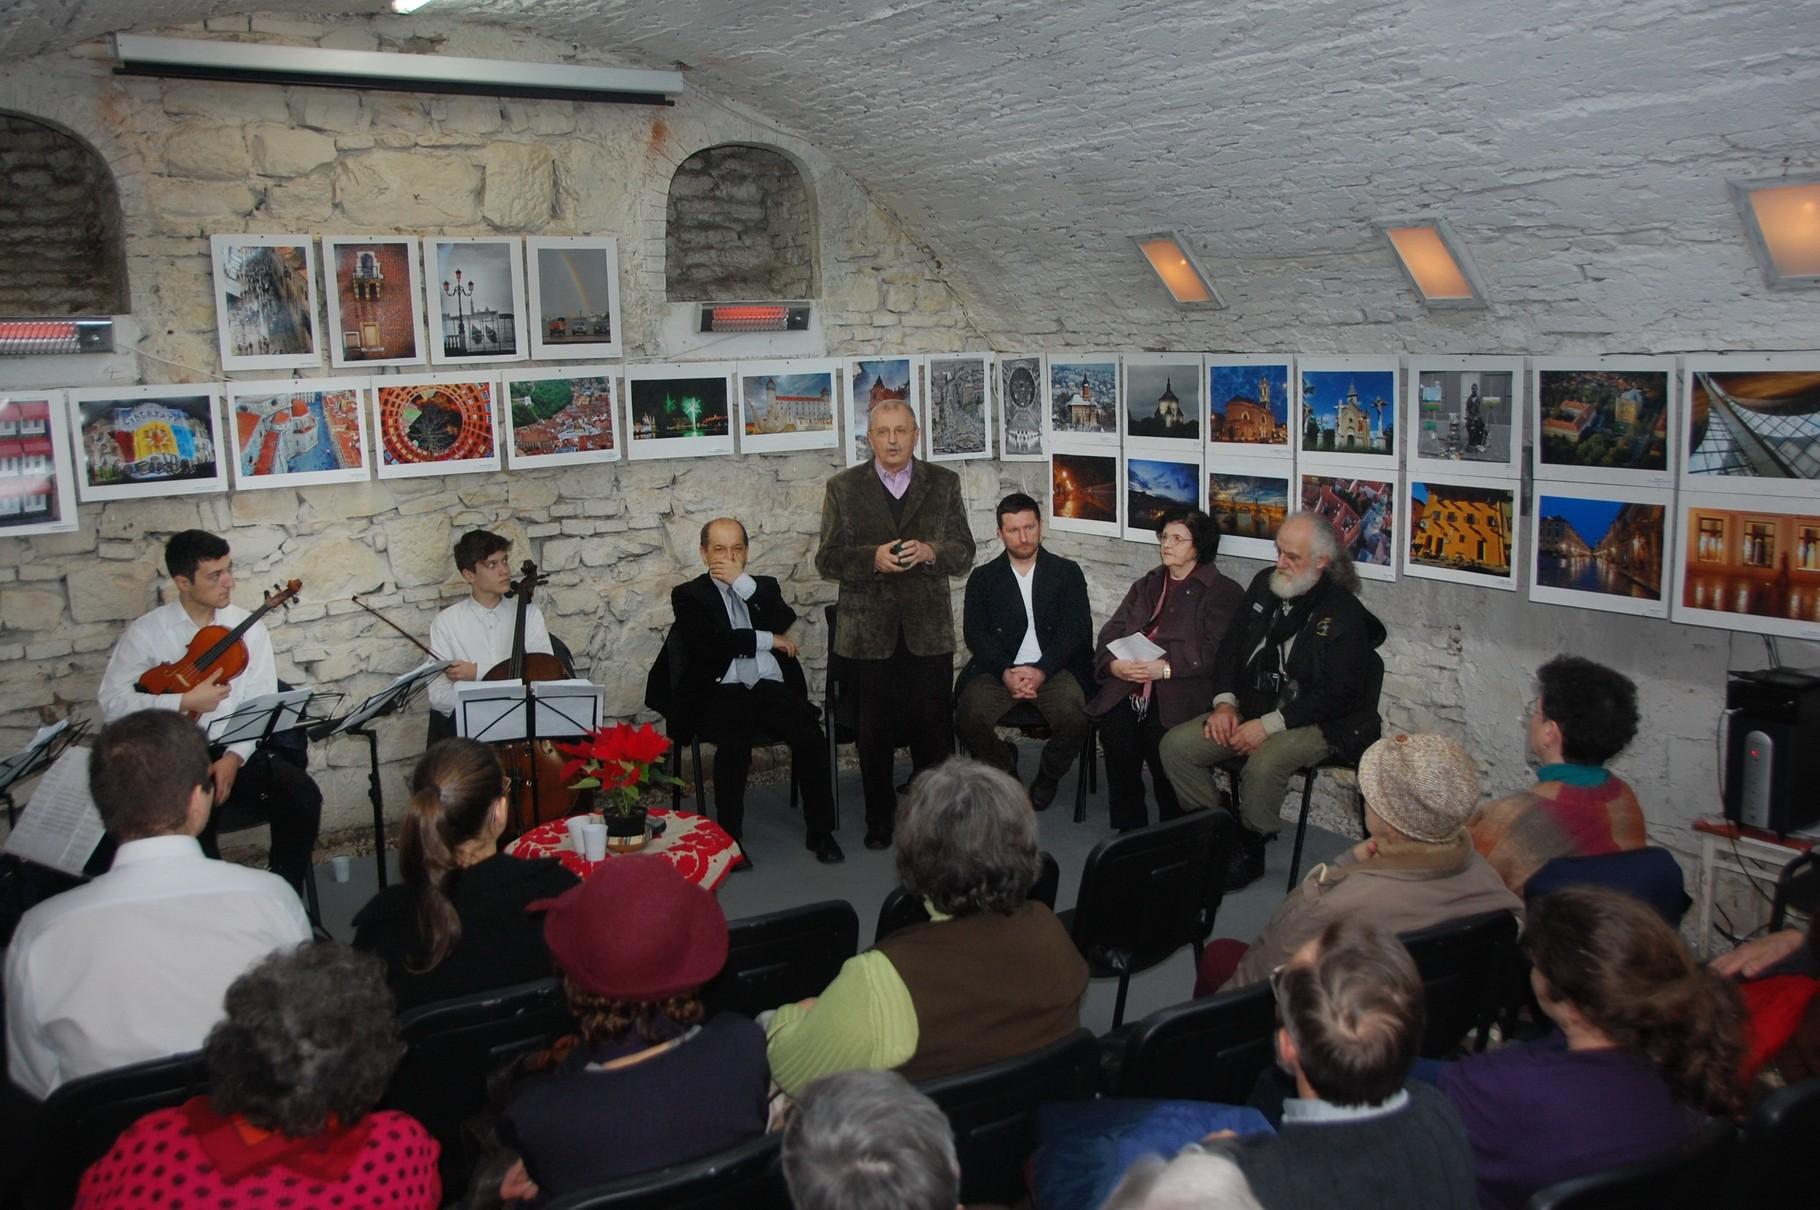 21.10.2014 Cluj Napoca (RO)